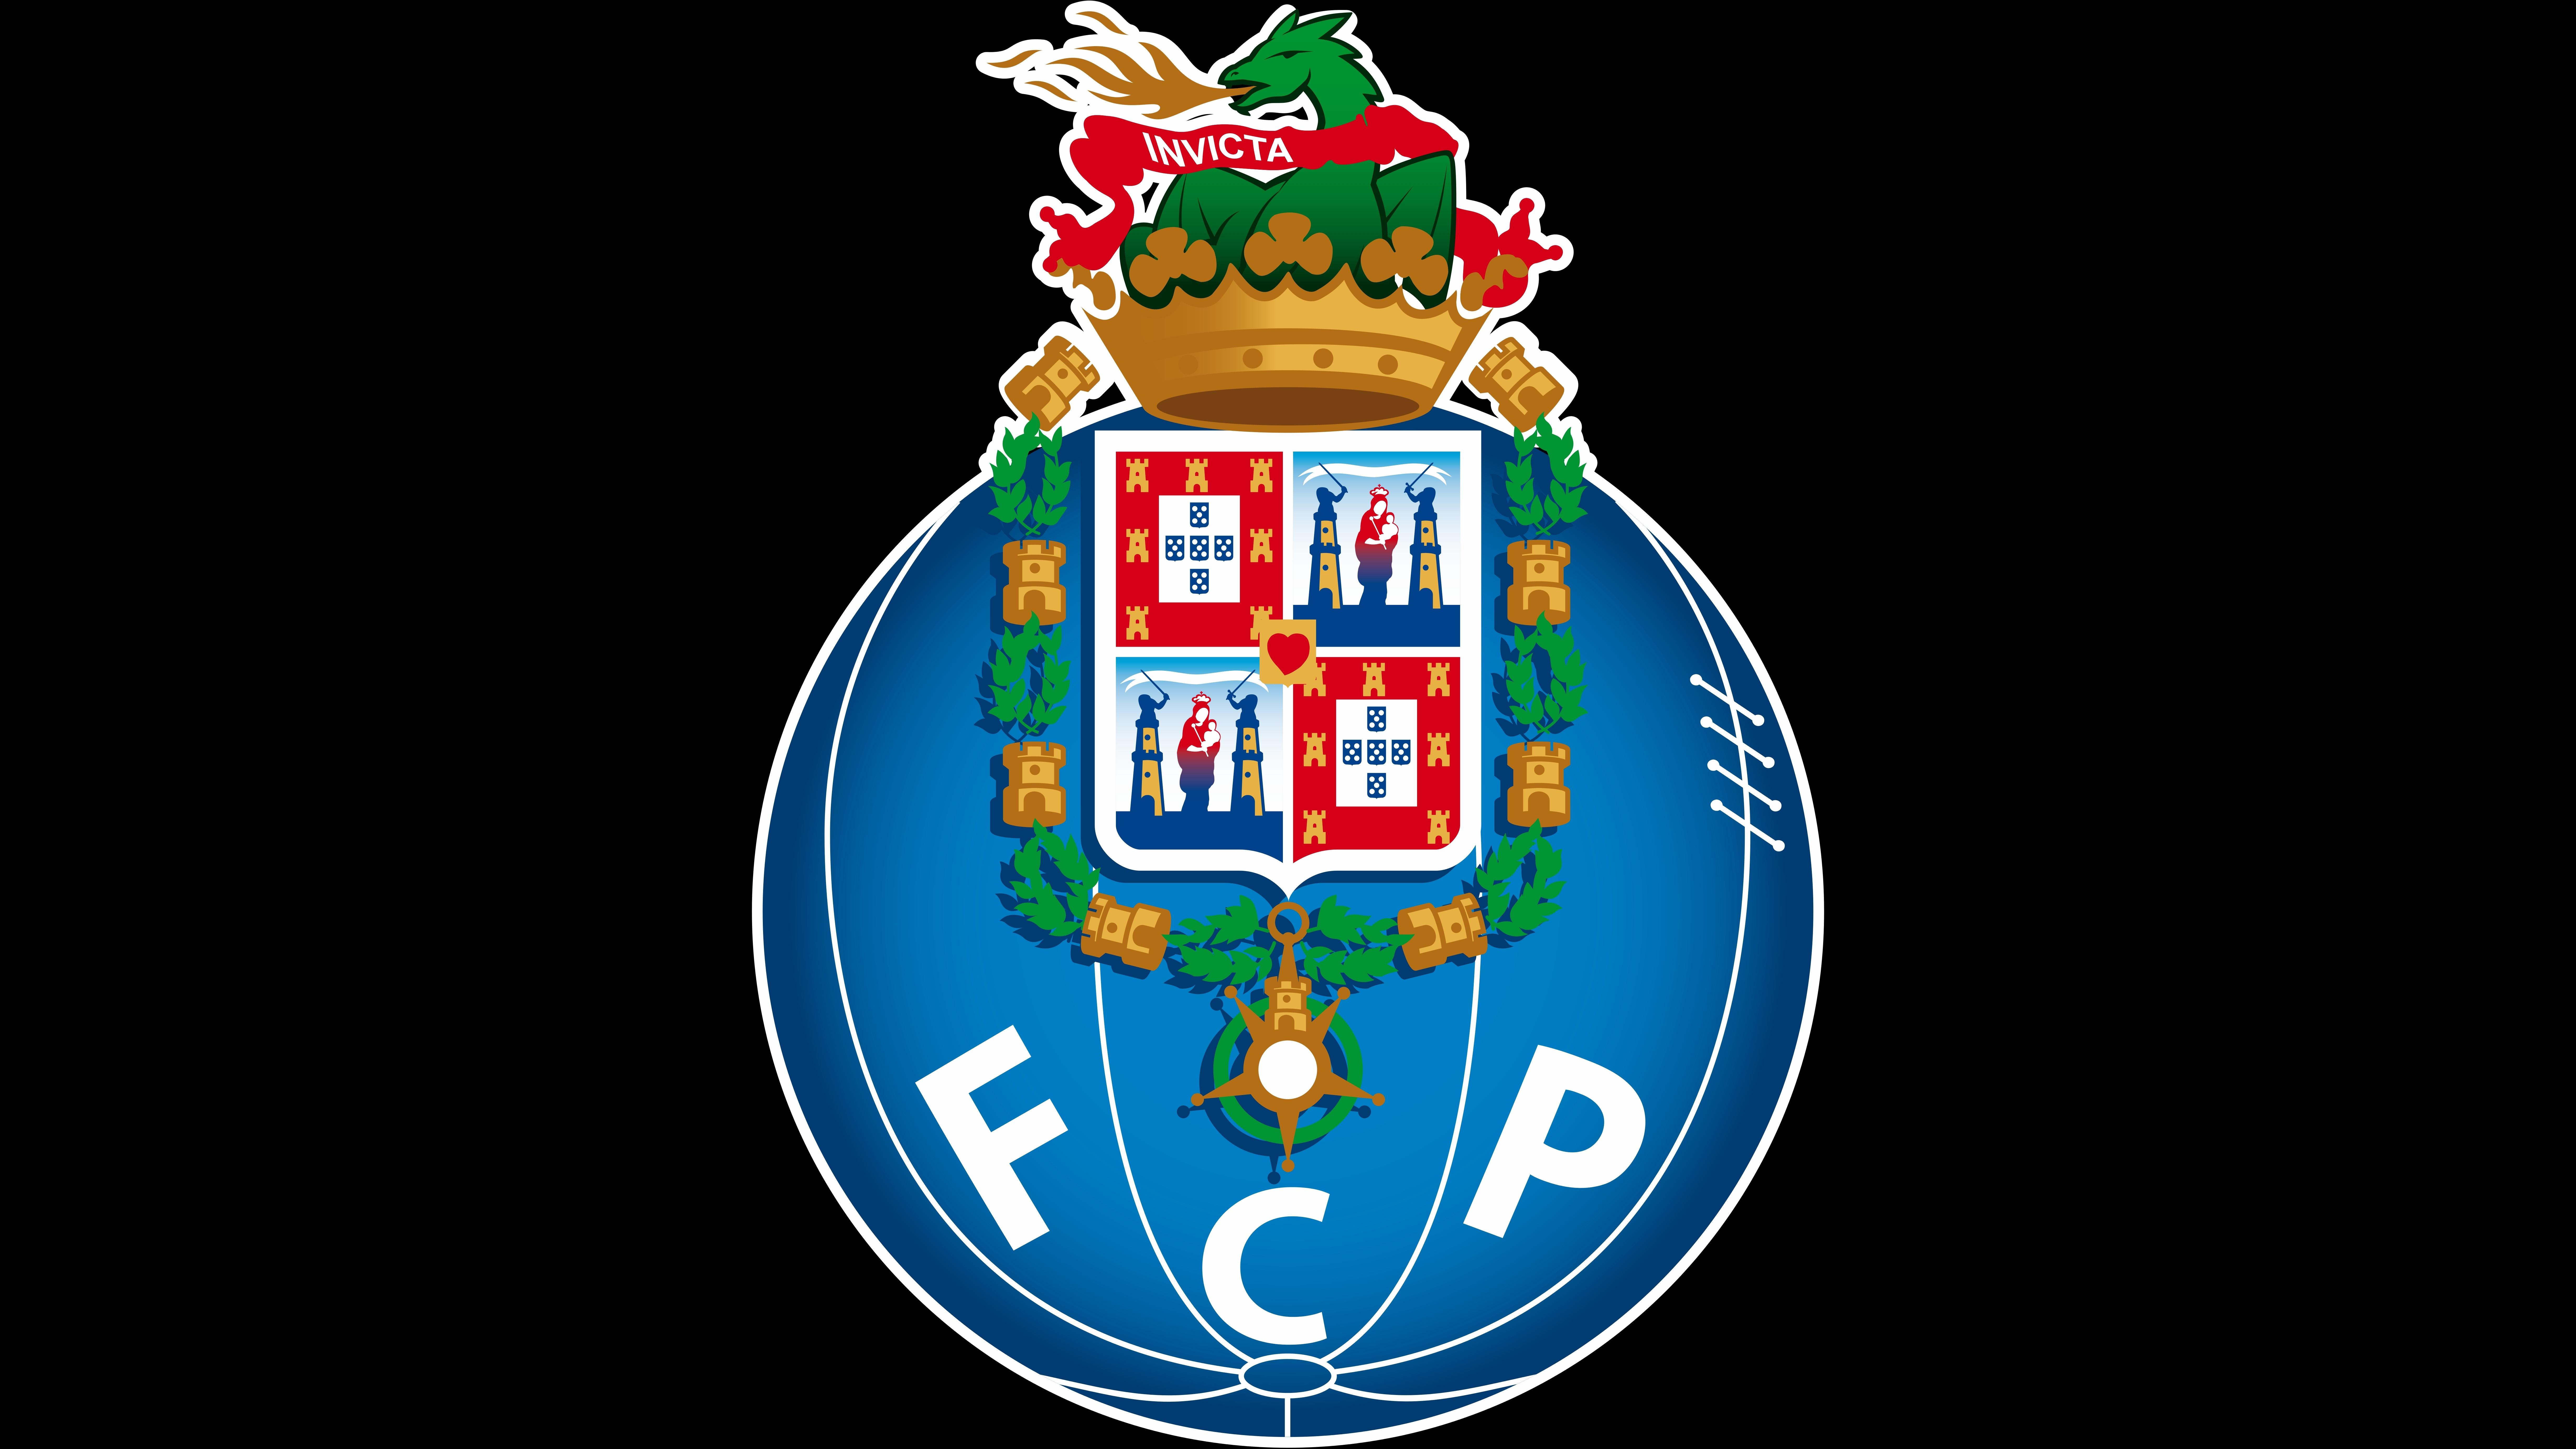 FC Porto Wallpaper 4   9827 X 5526 stmednet 9827x5526